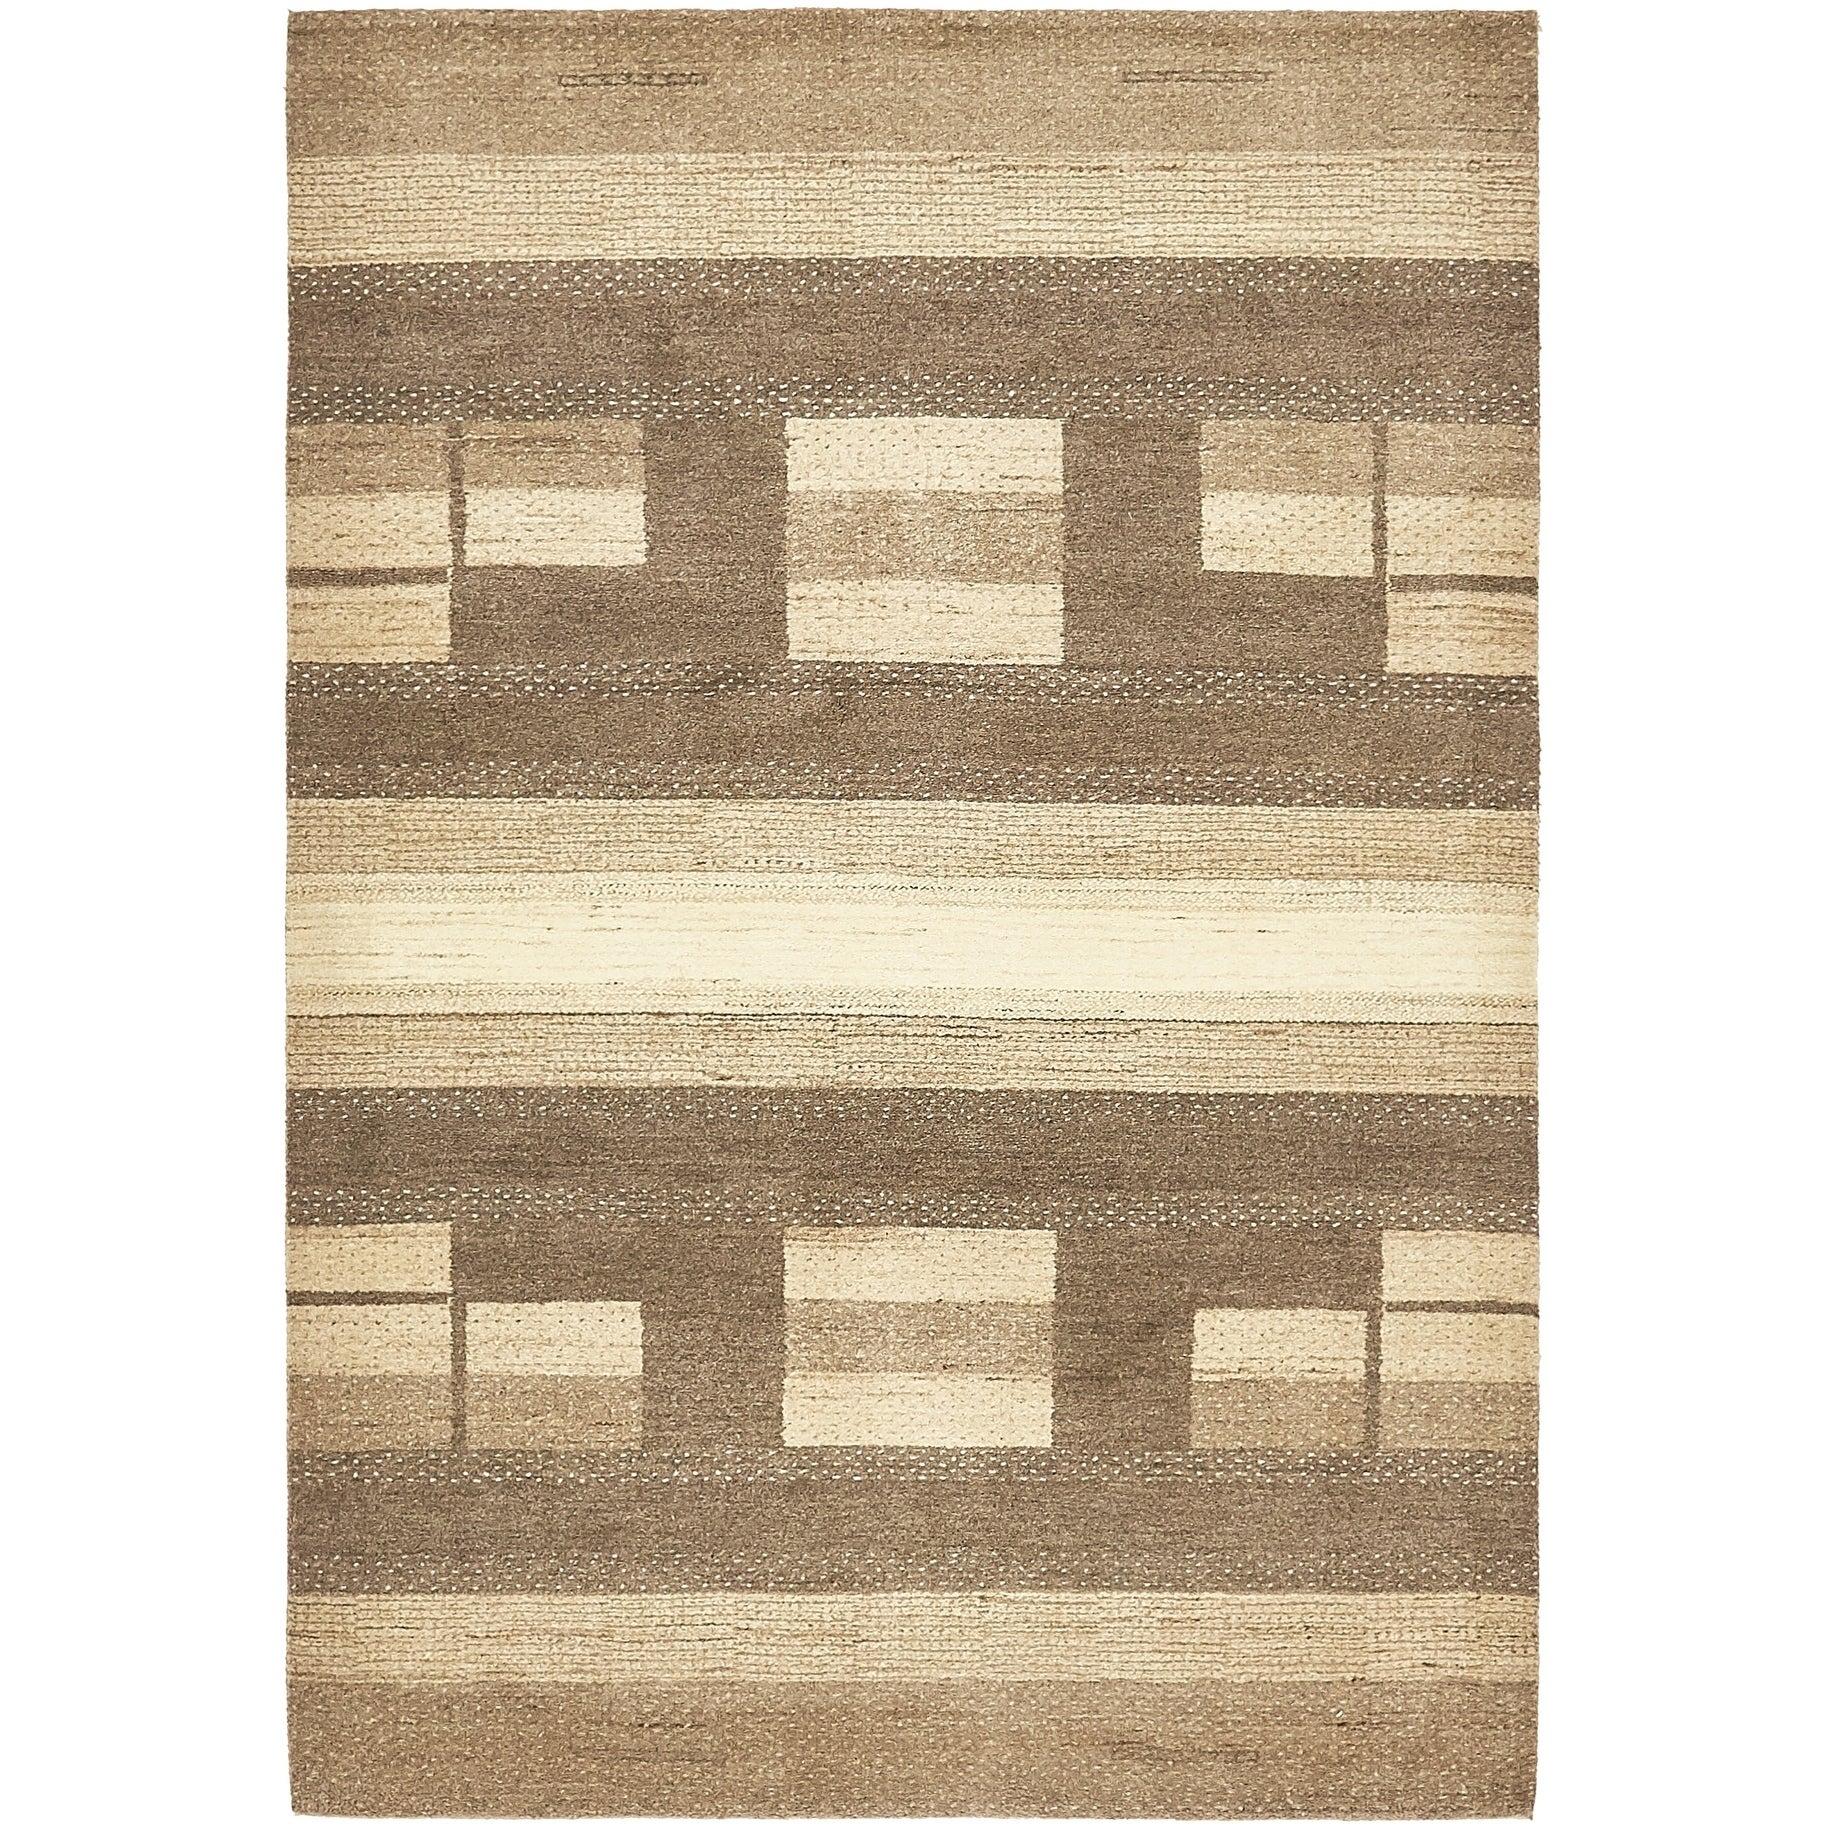 Hand Knotted Kashkuli Gabbeh Wool Area Rug - 4 8 x 6 10 (Brown - 4 8 x 6 10)